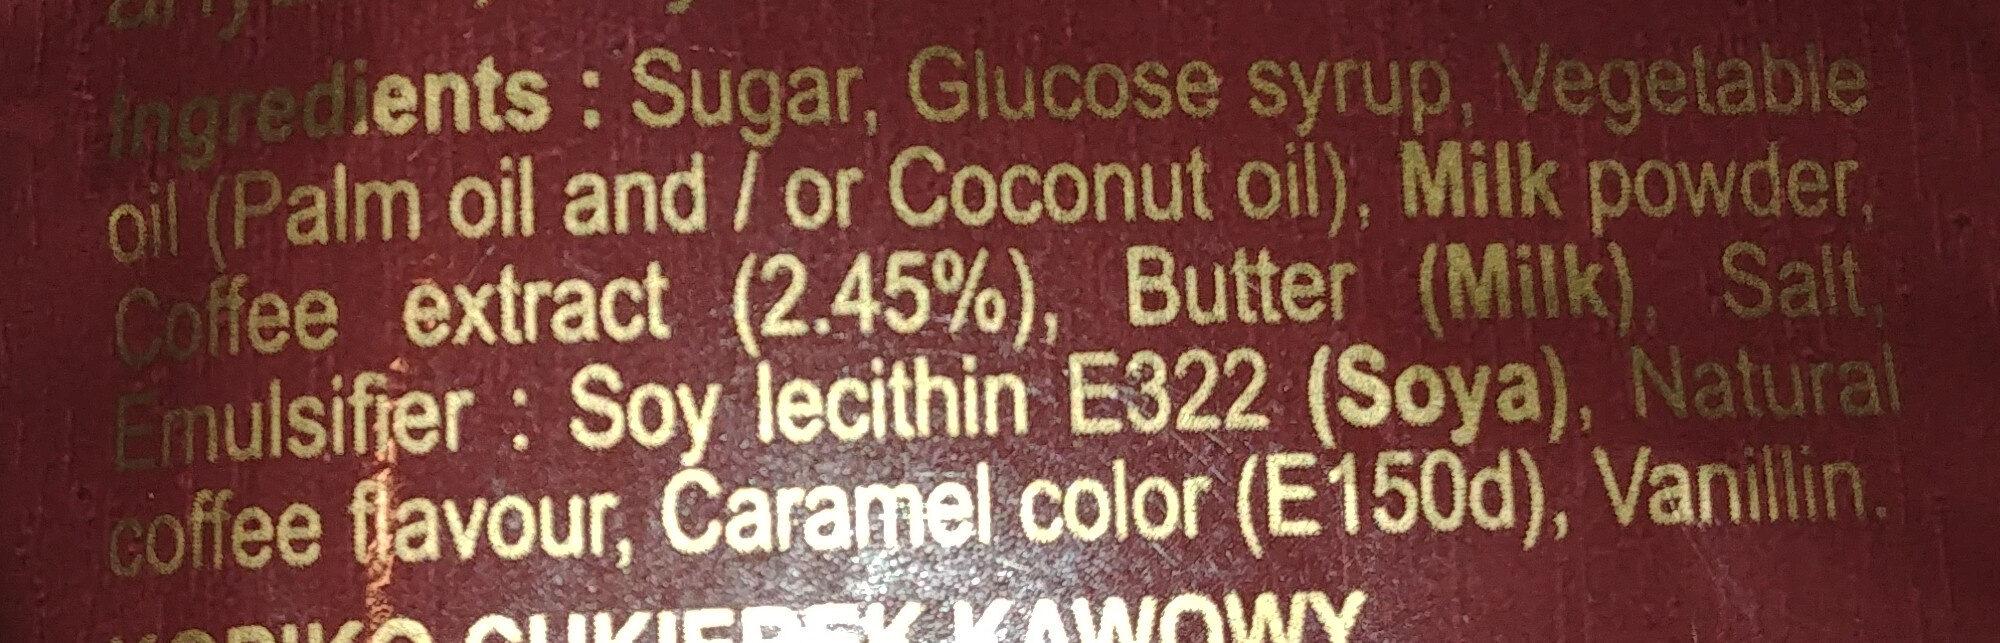 Cukierek kawowy - Ingredients